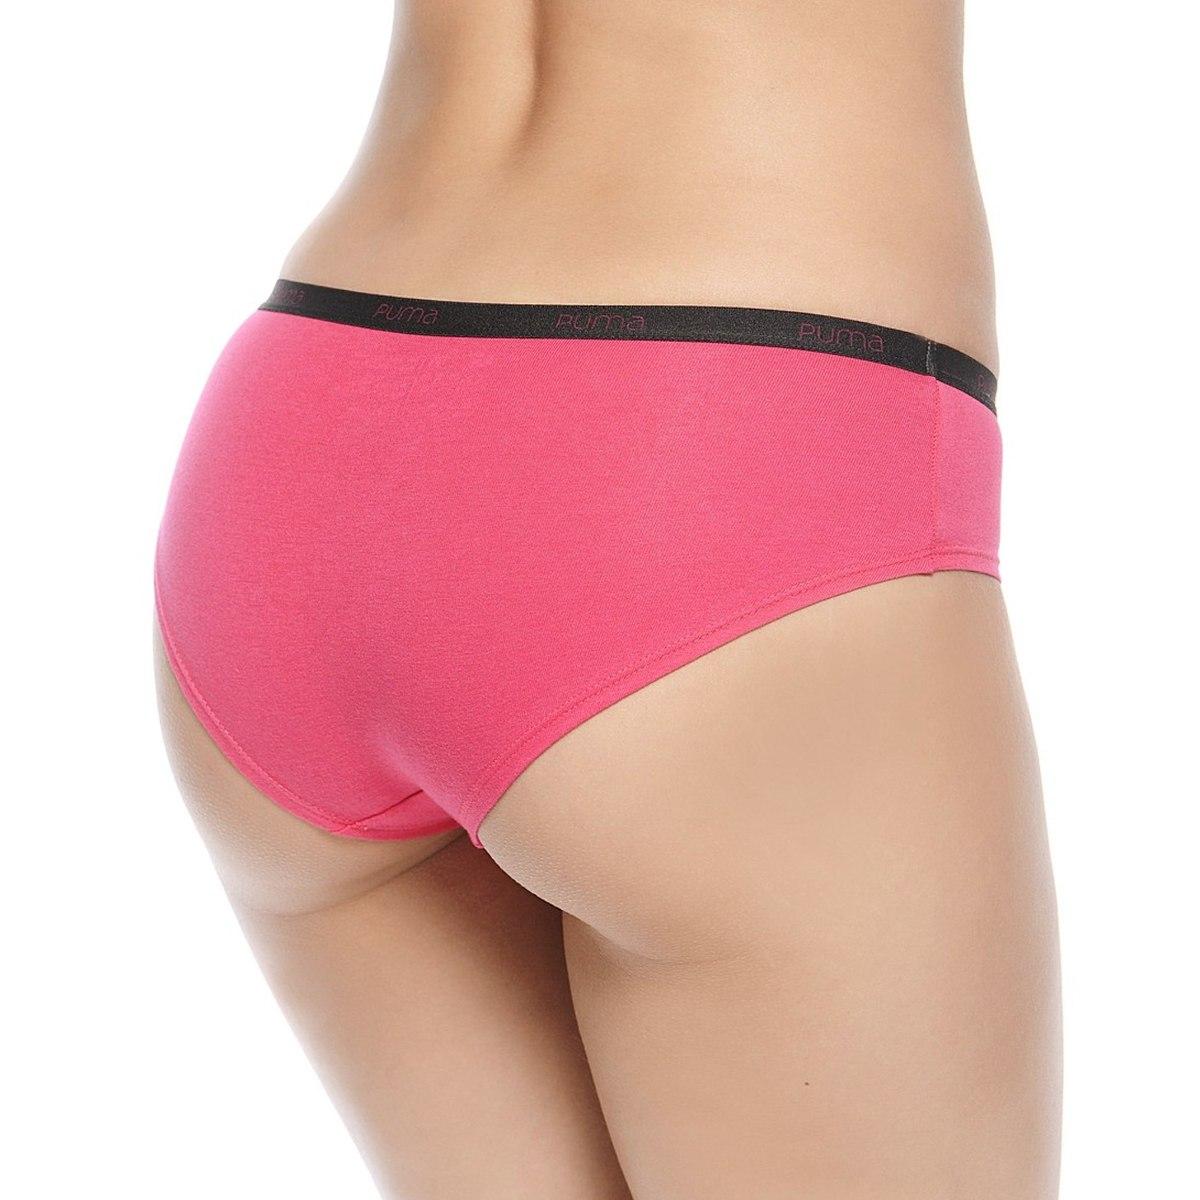 a6fc4734f5d5 2 Calzones Cotton Stretch Para Mujer 17 Puma 906348 - $ 199.00 en ...